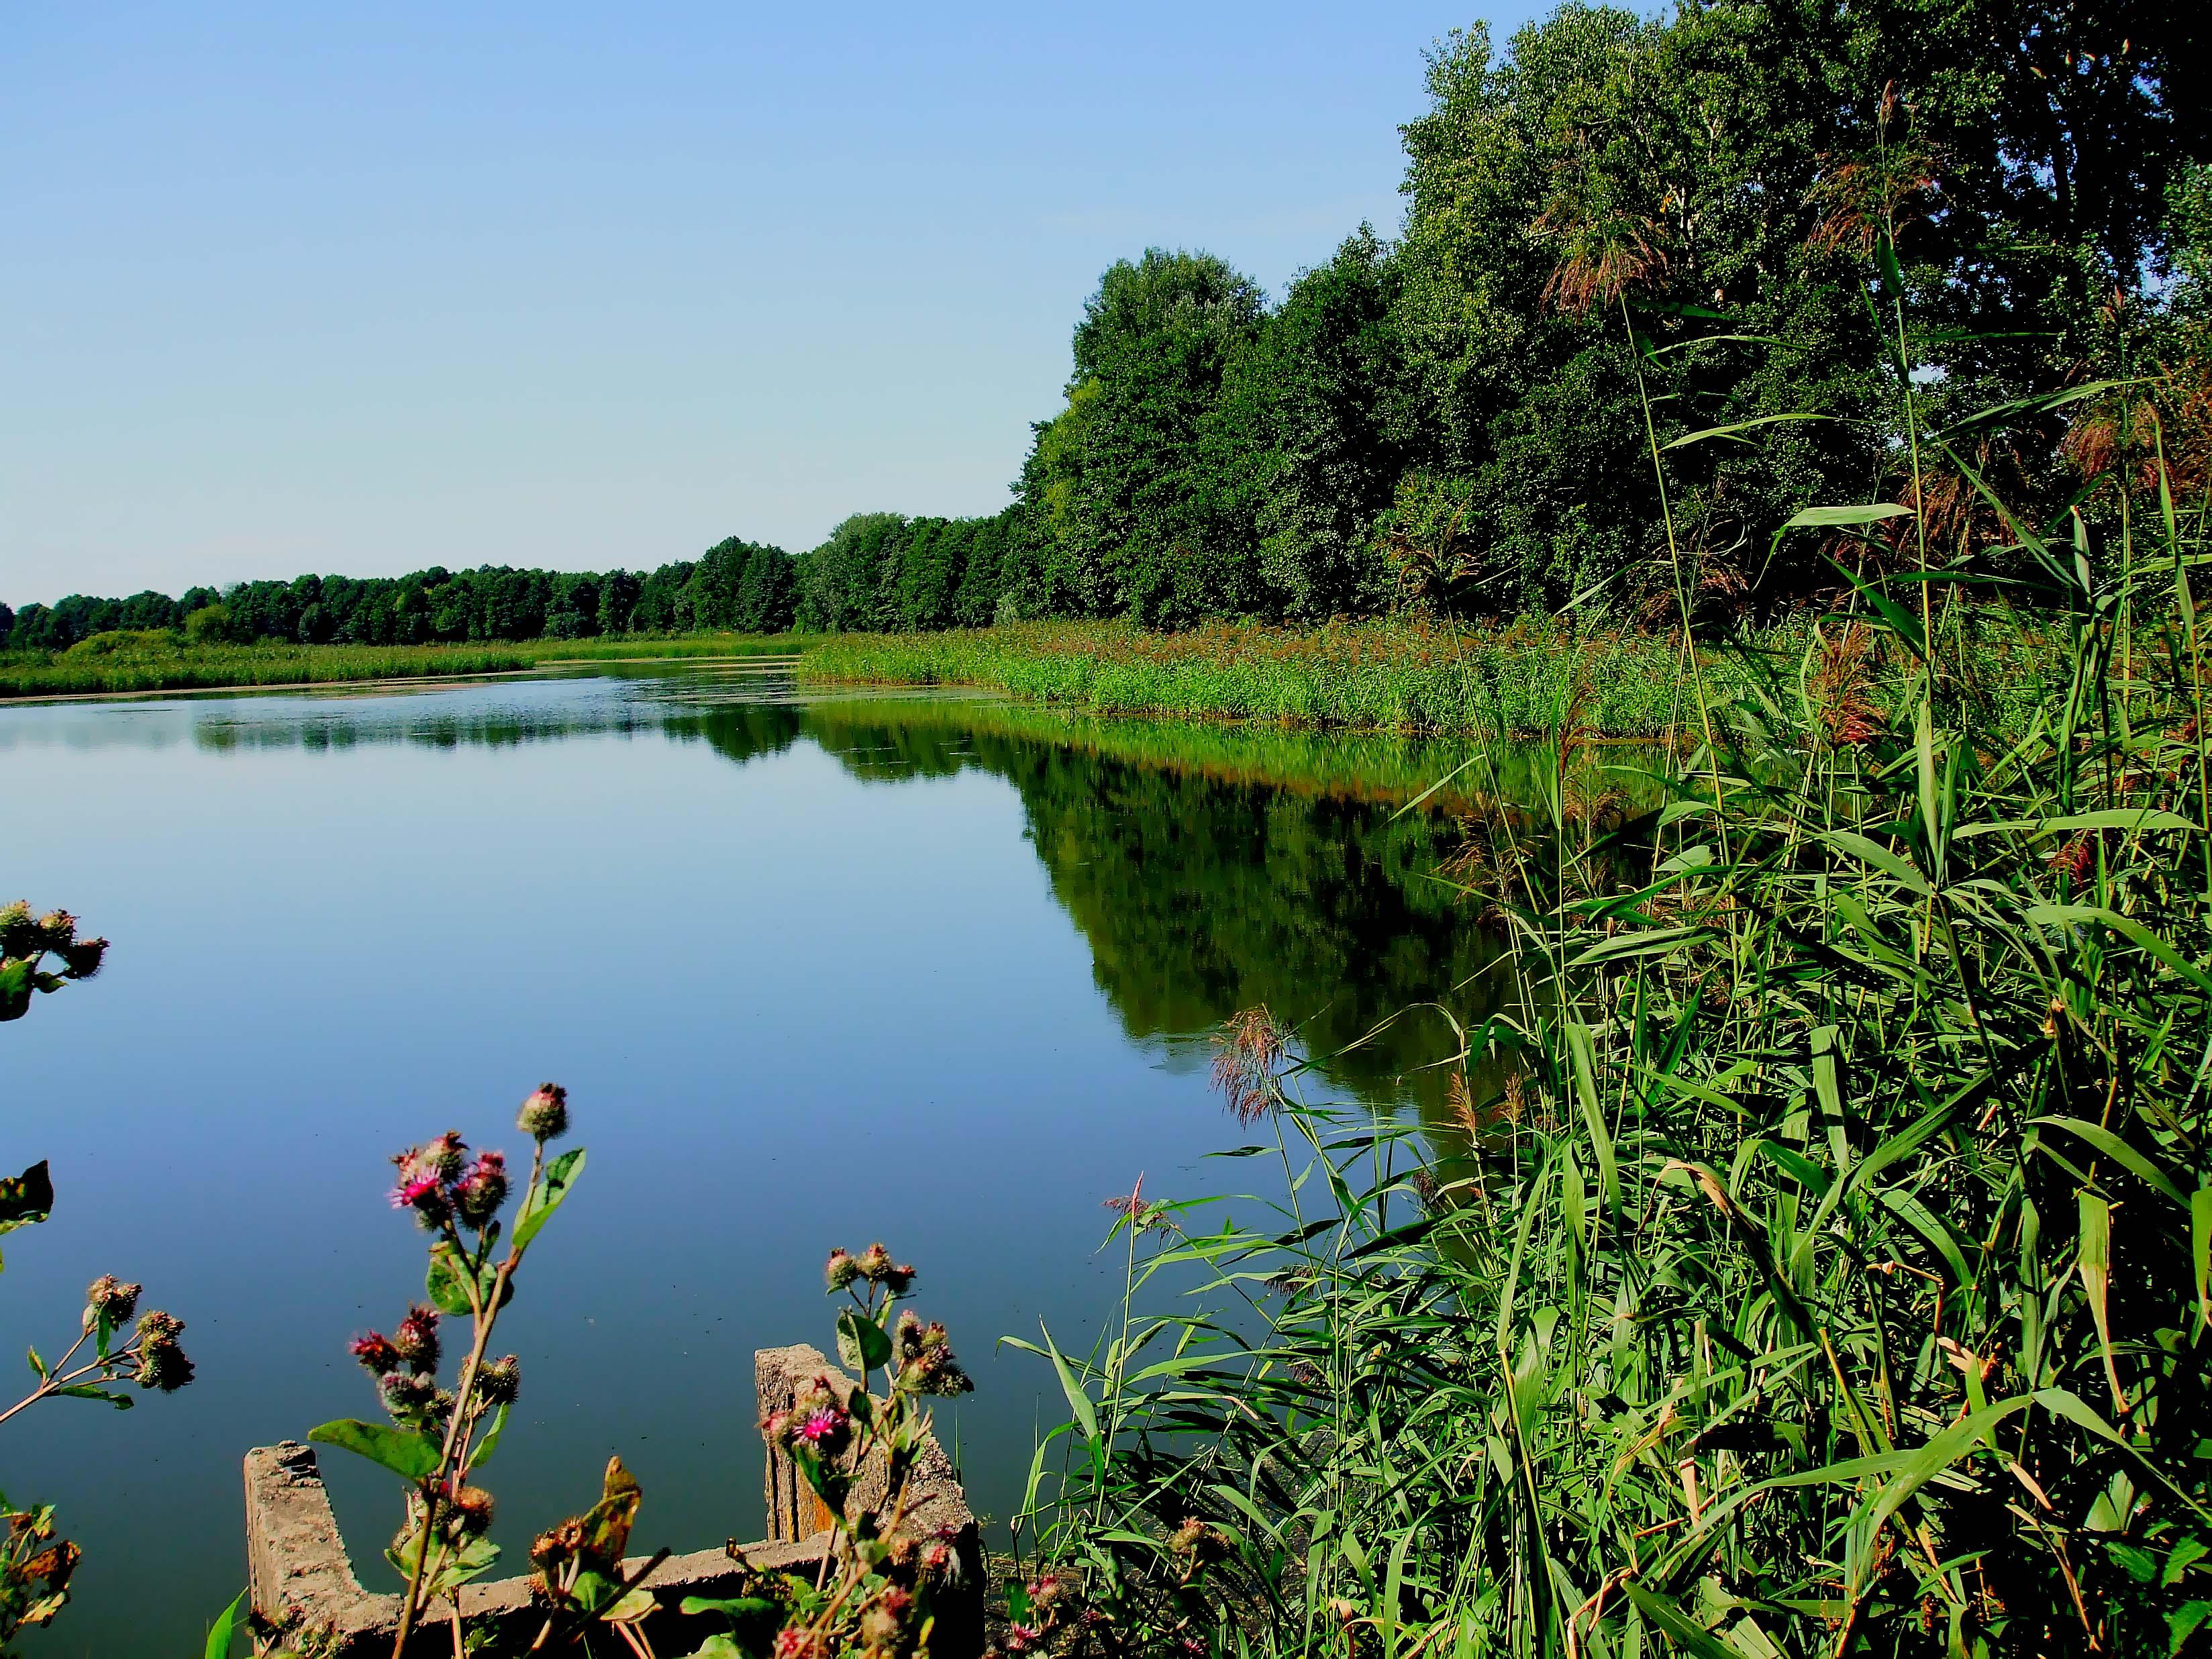 Лето озеро картинки на рабочий стол